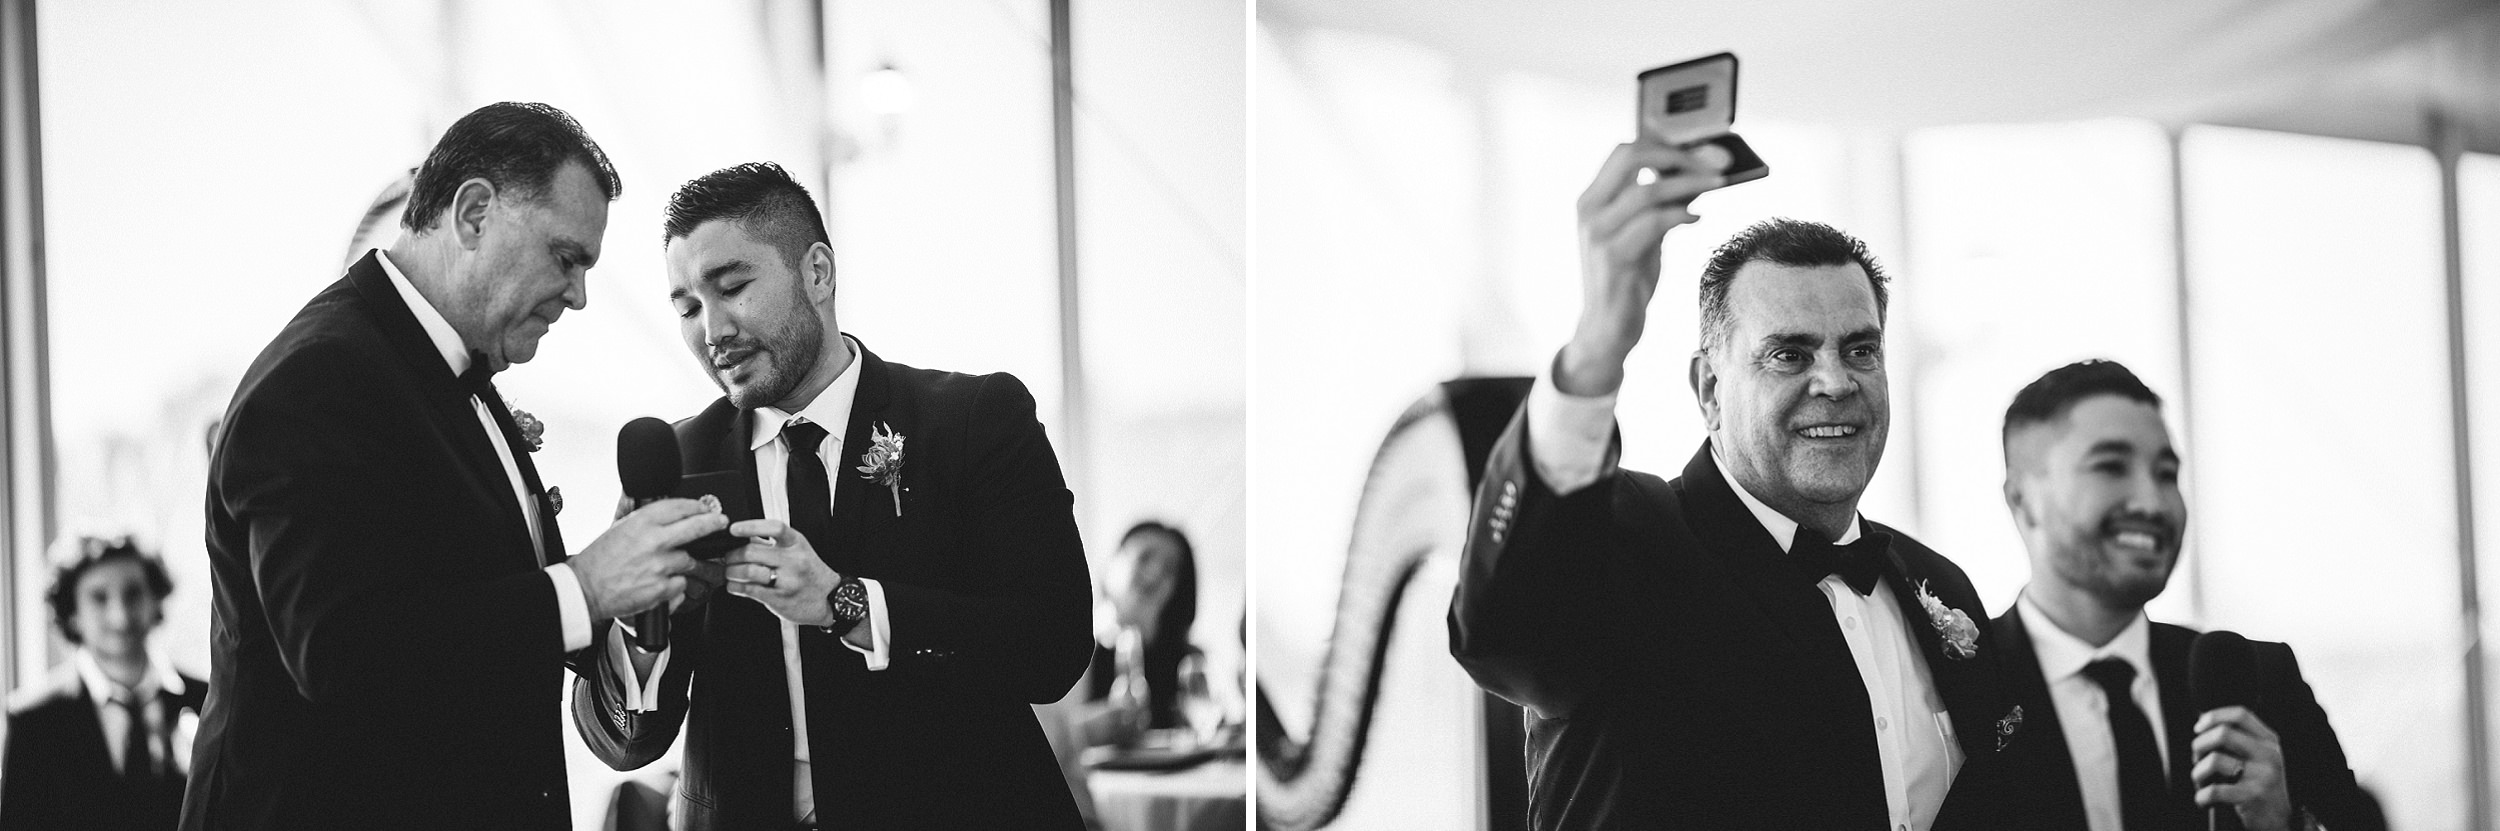 Oakland-Wedding-Photography-033.jpg